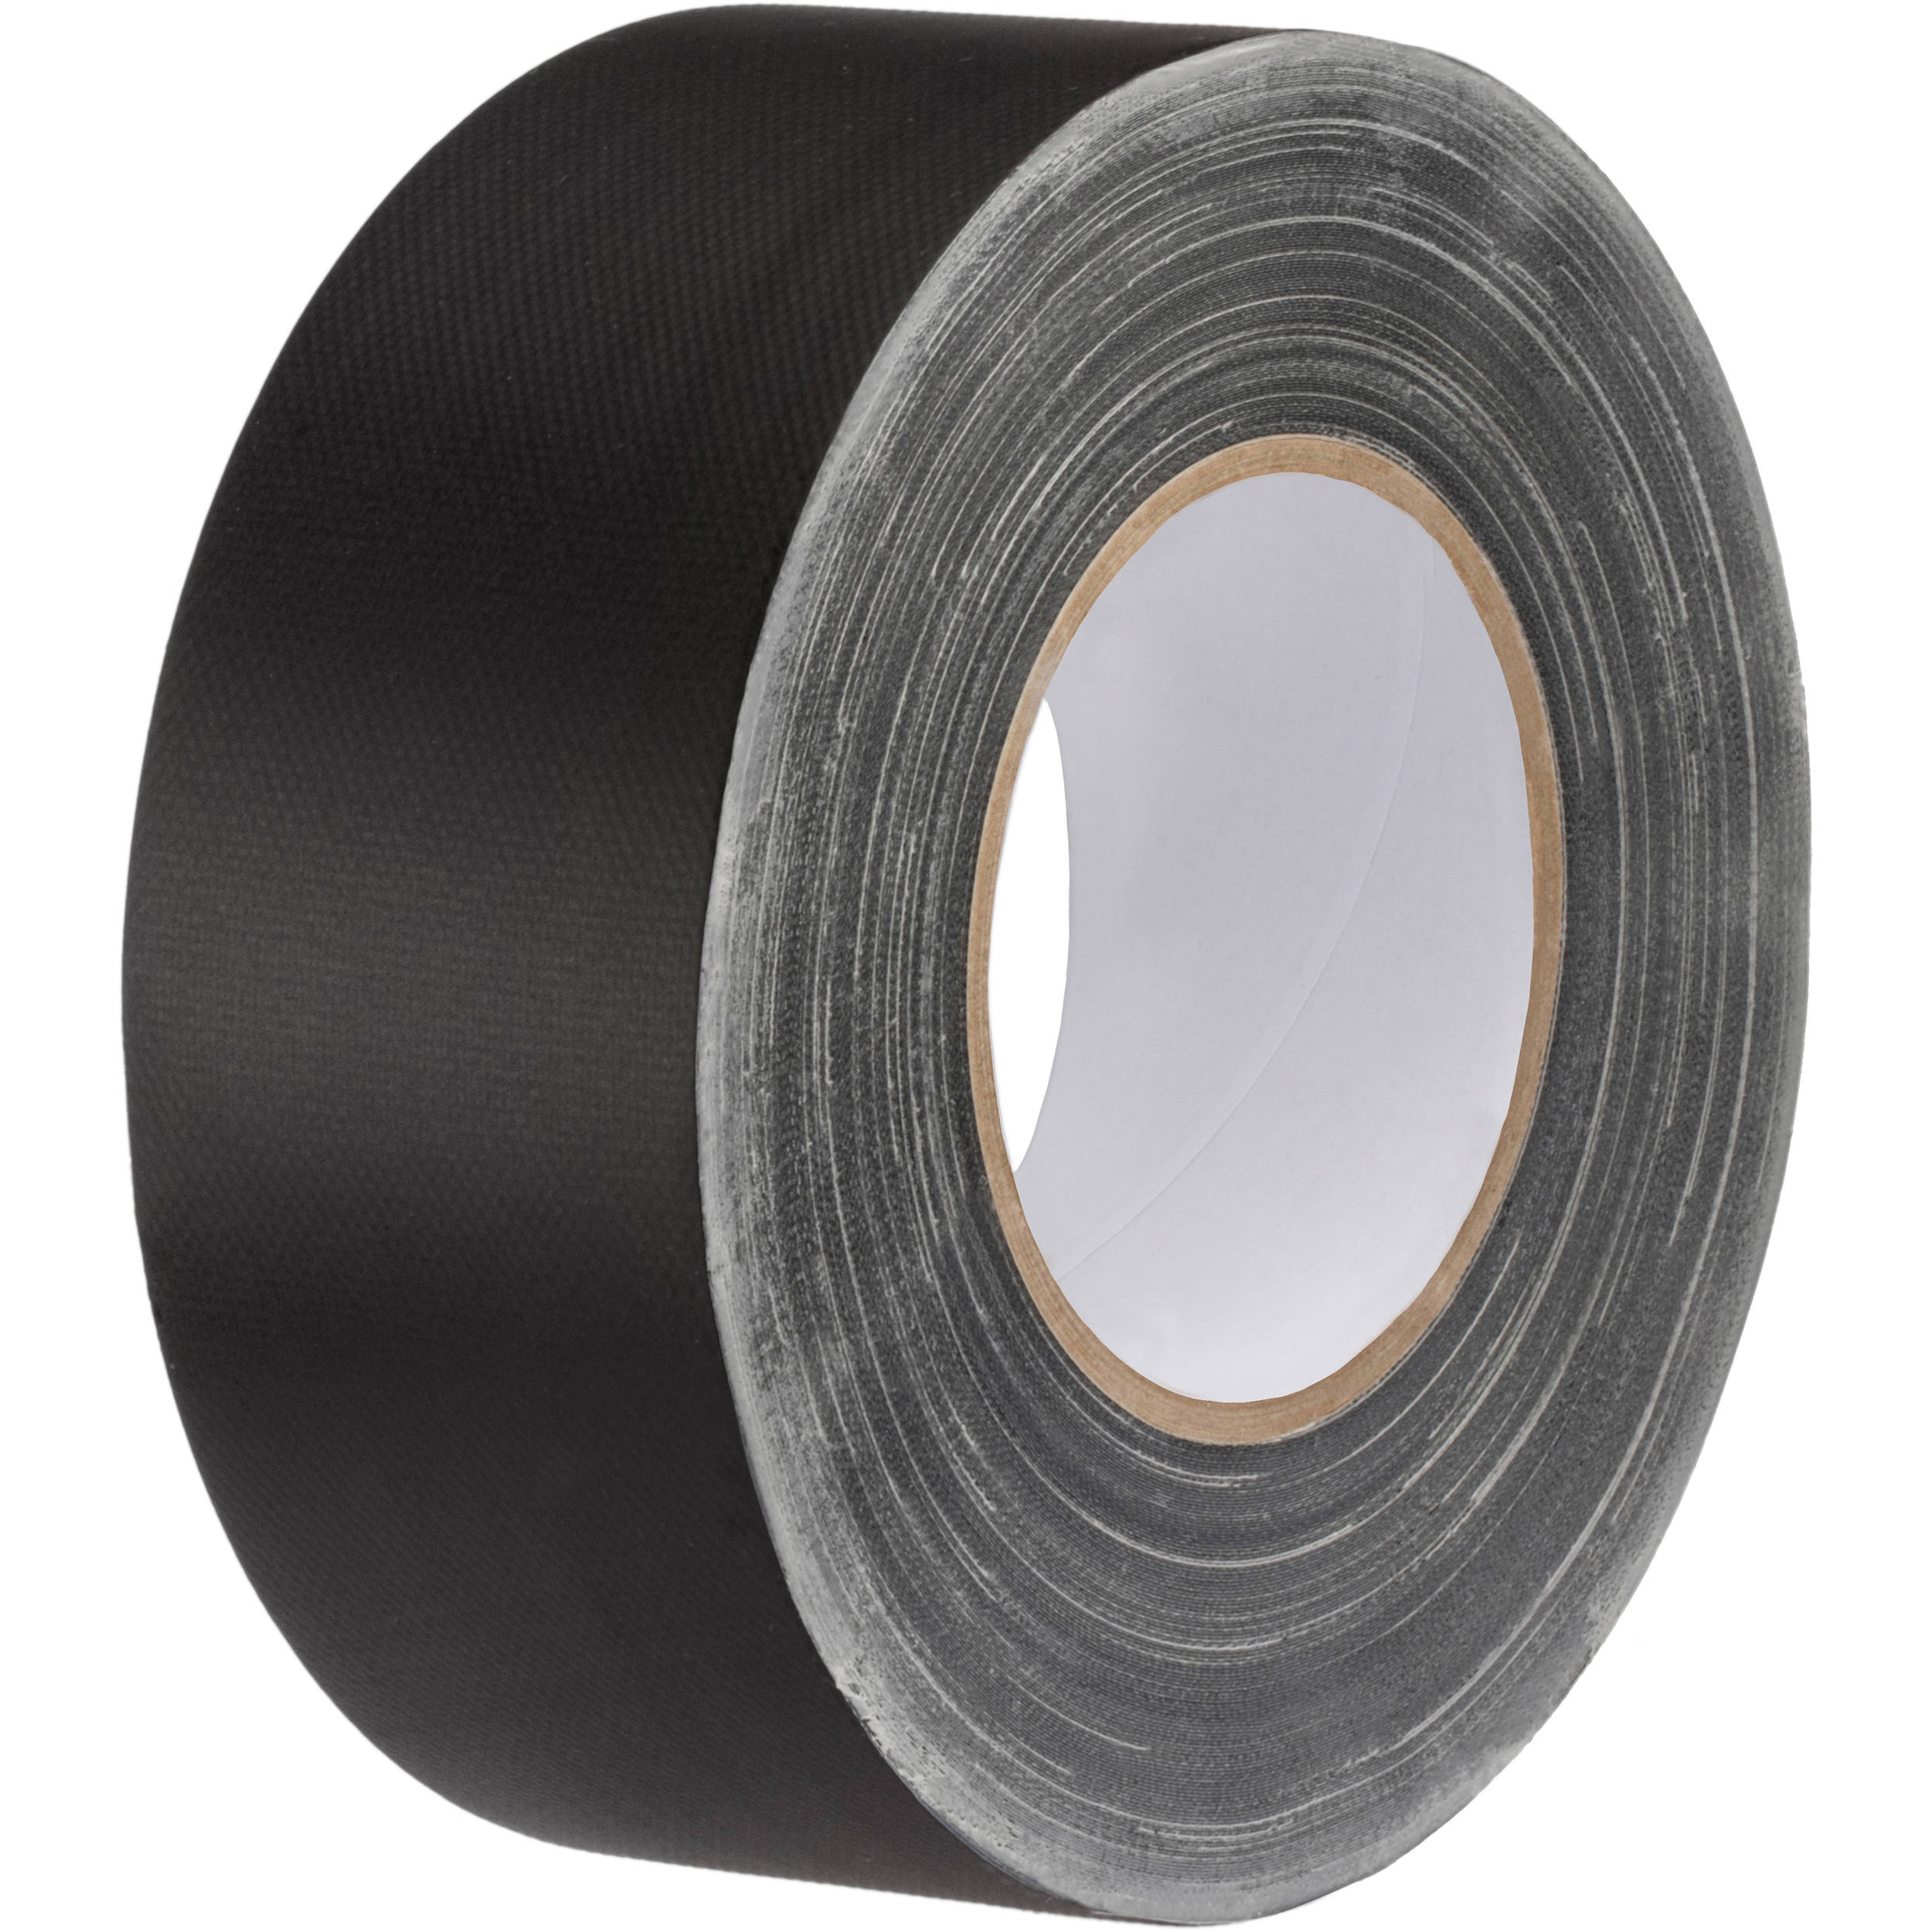 Impact Gaffer Tape Black, 2 x 12 yd